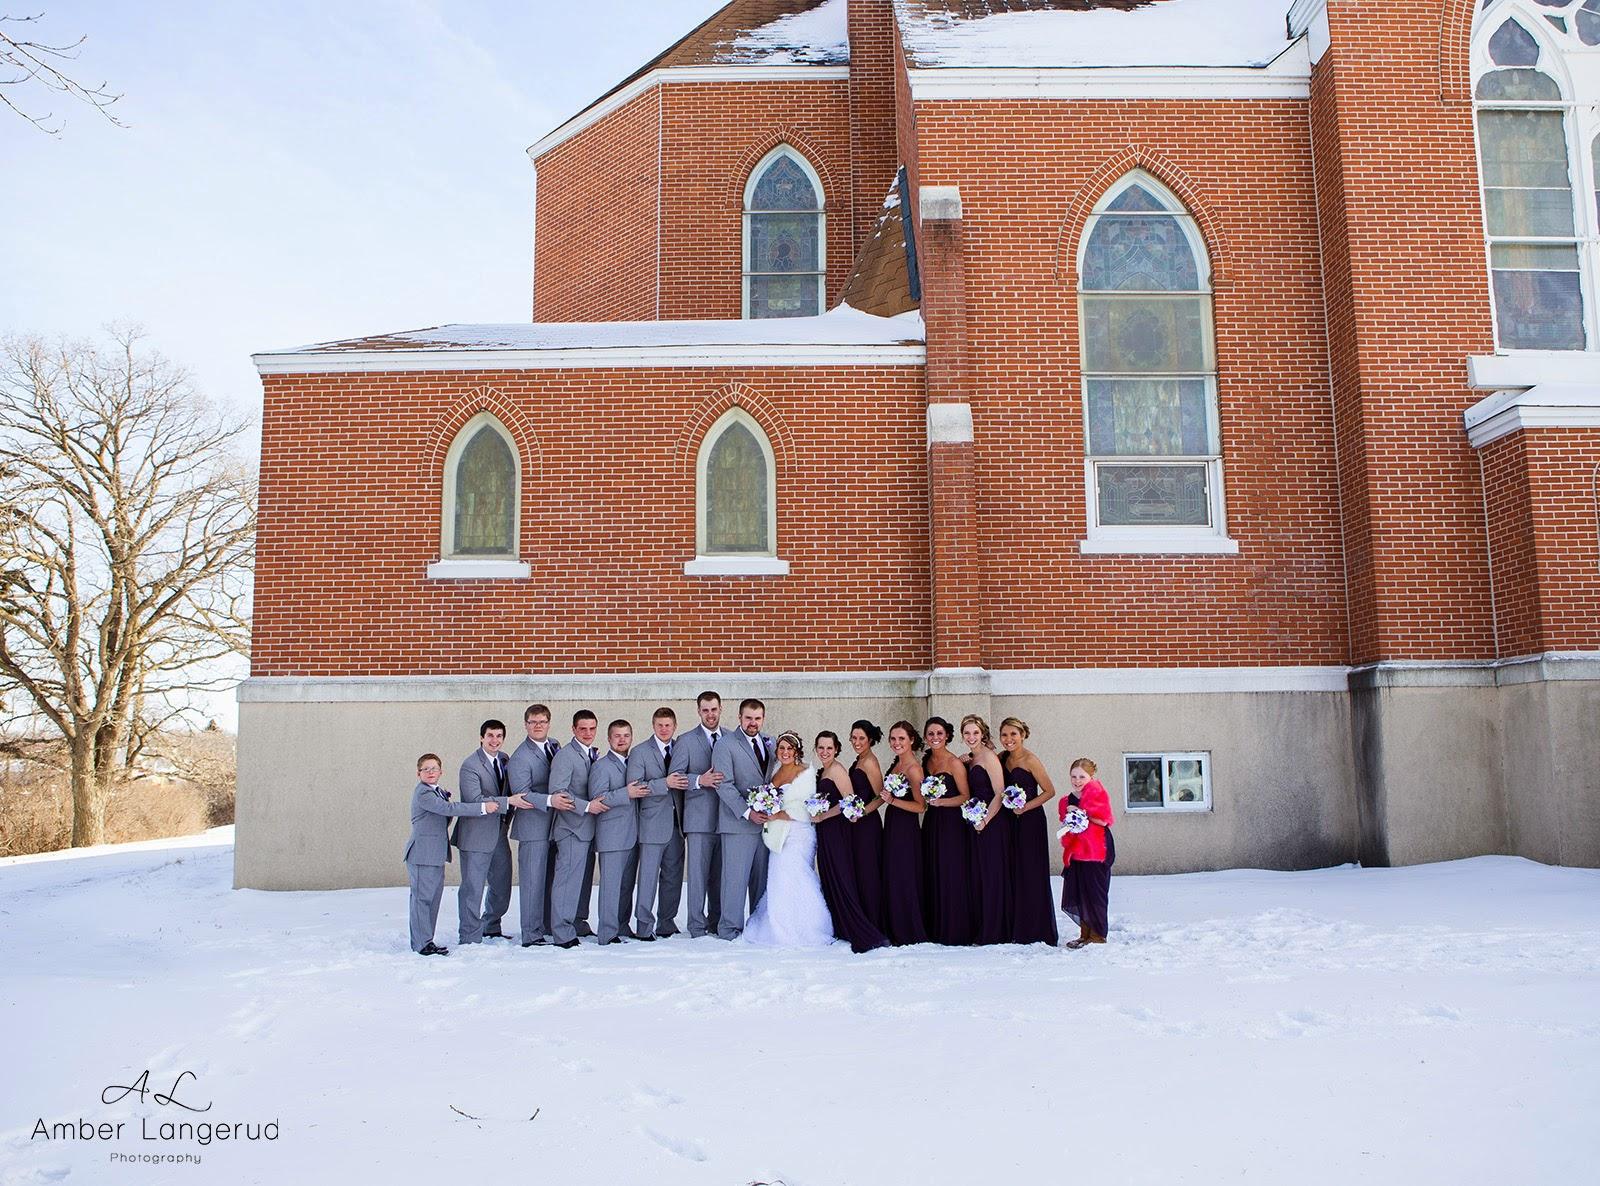 Frazee, MN Valentines Day Winter Wedding | Amber Langerud Photography